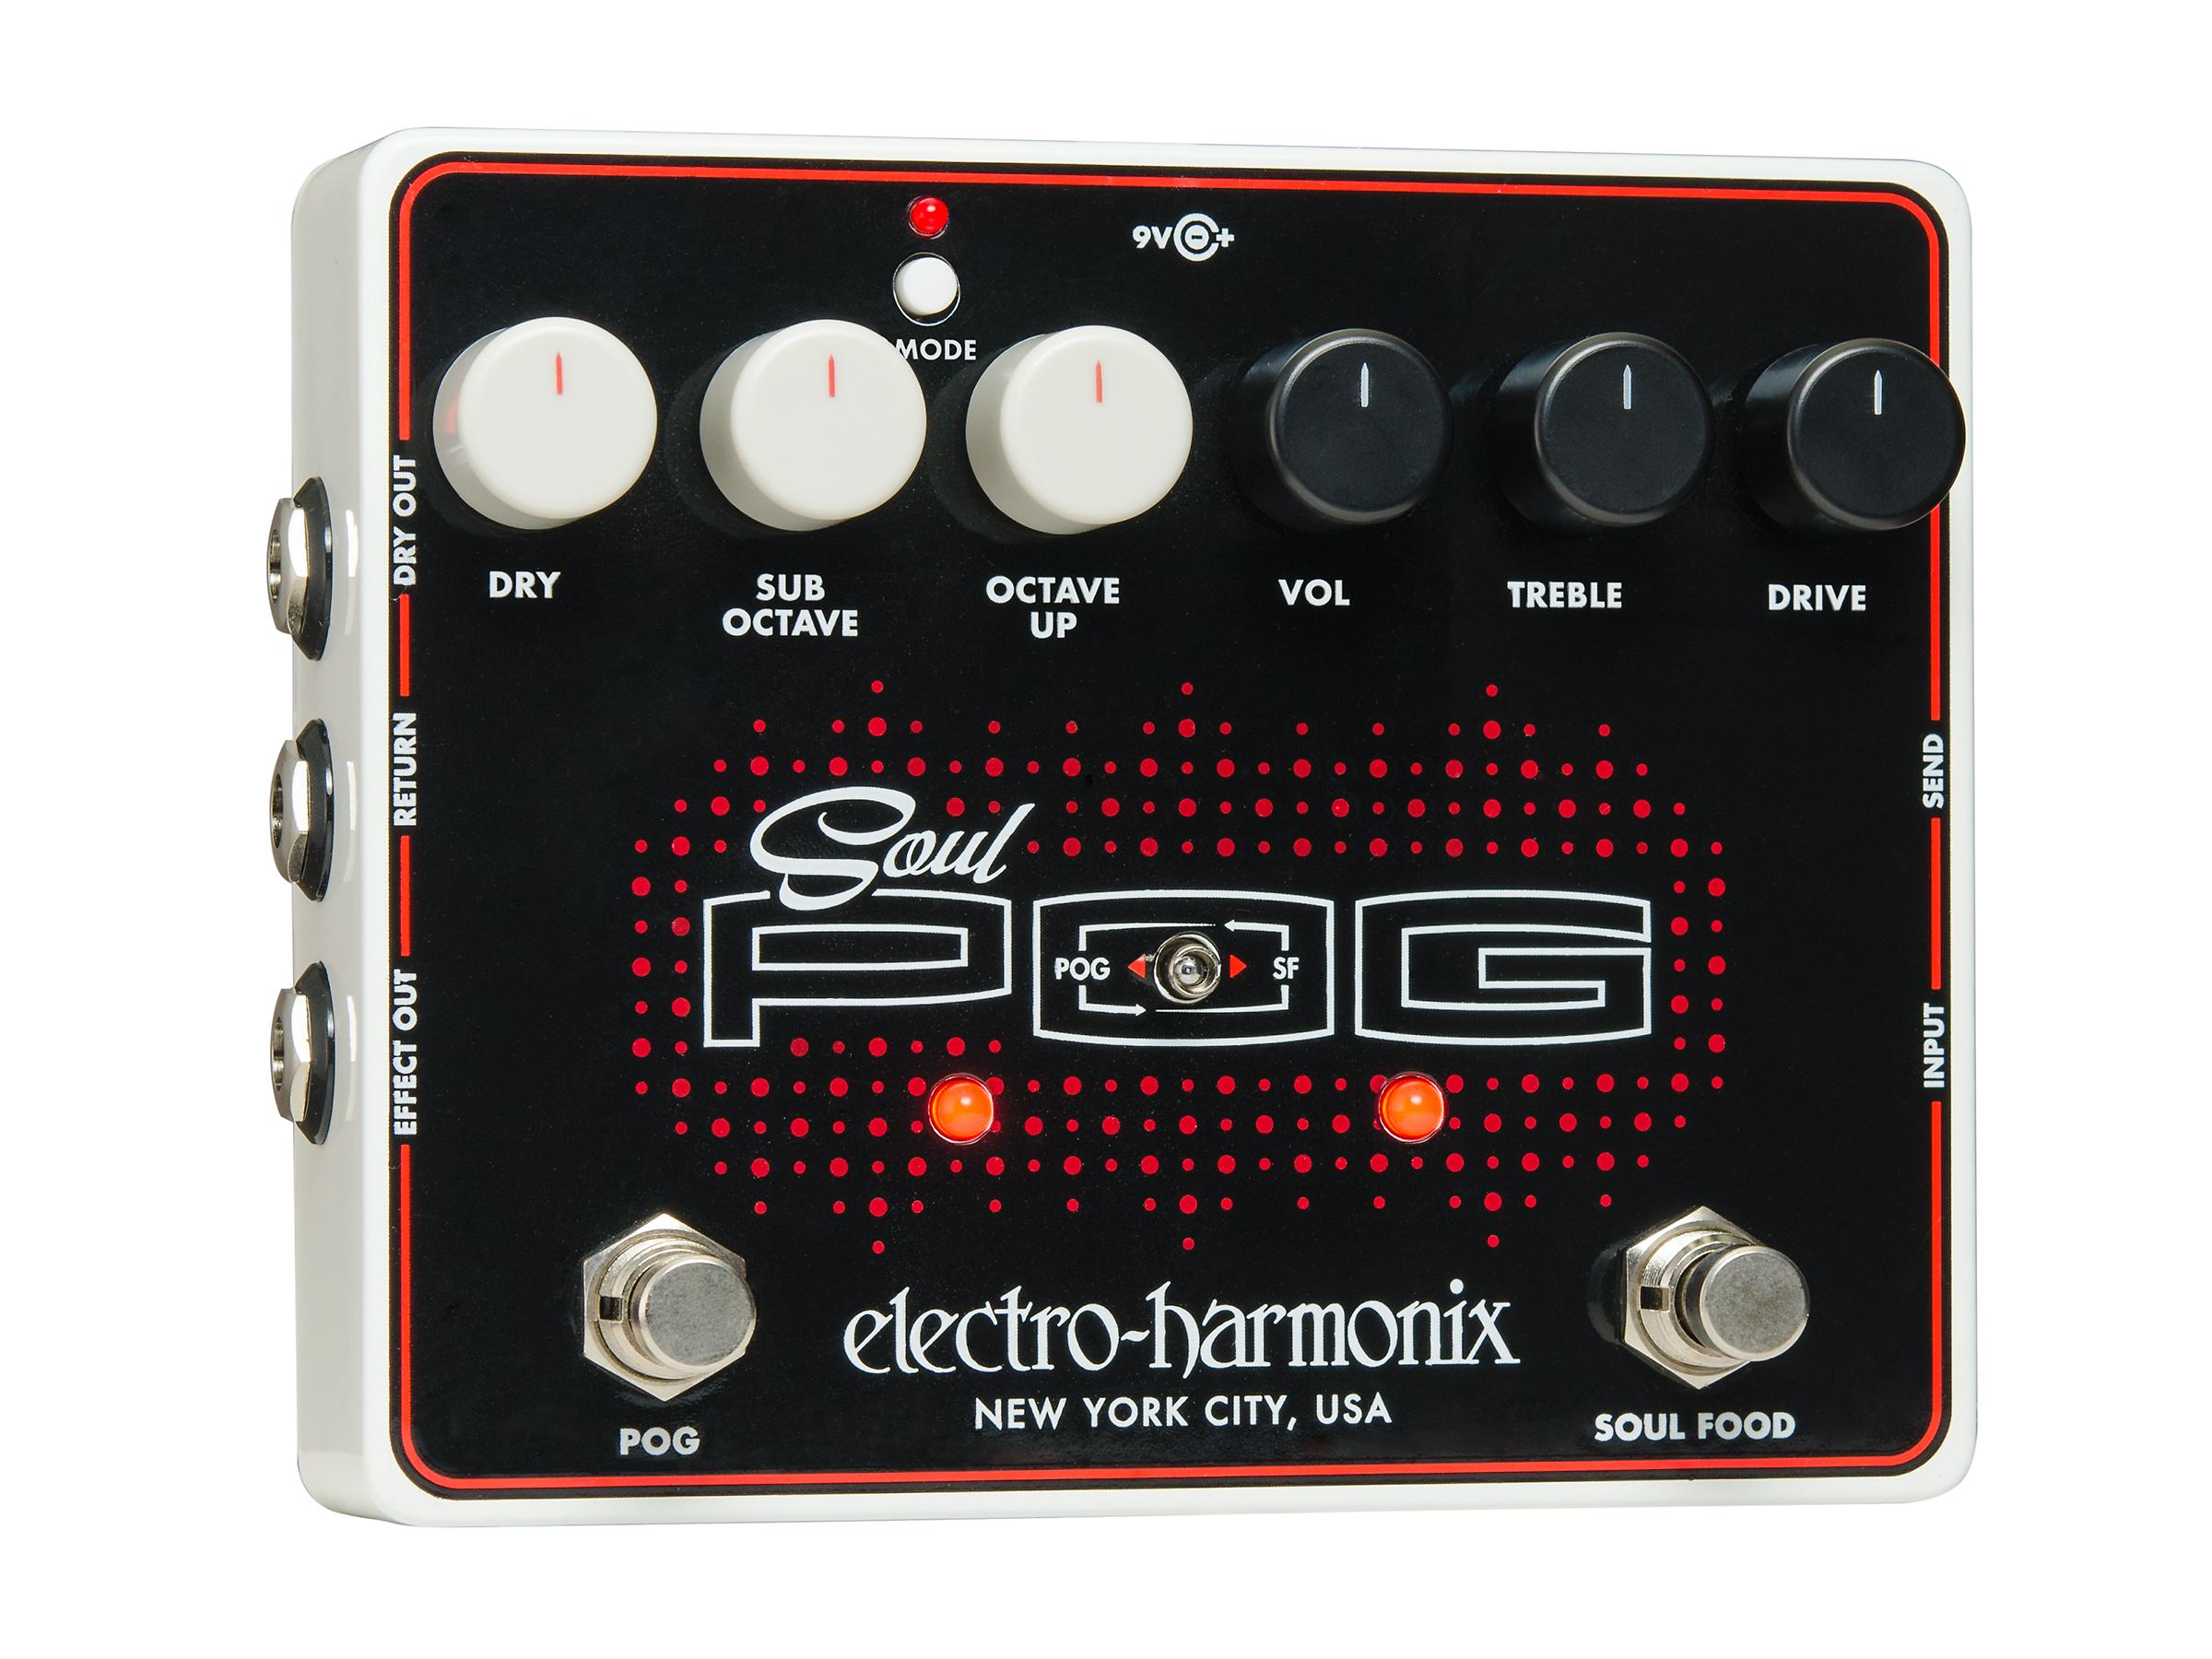 electro harmonix soul food manual